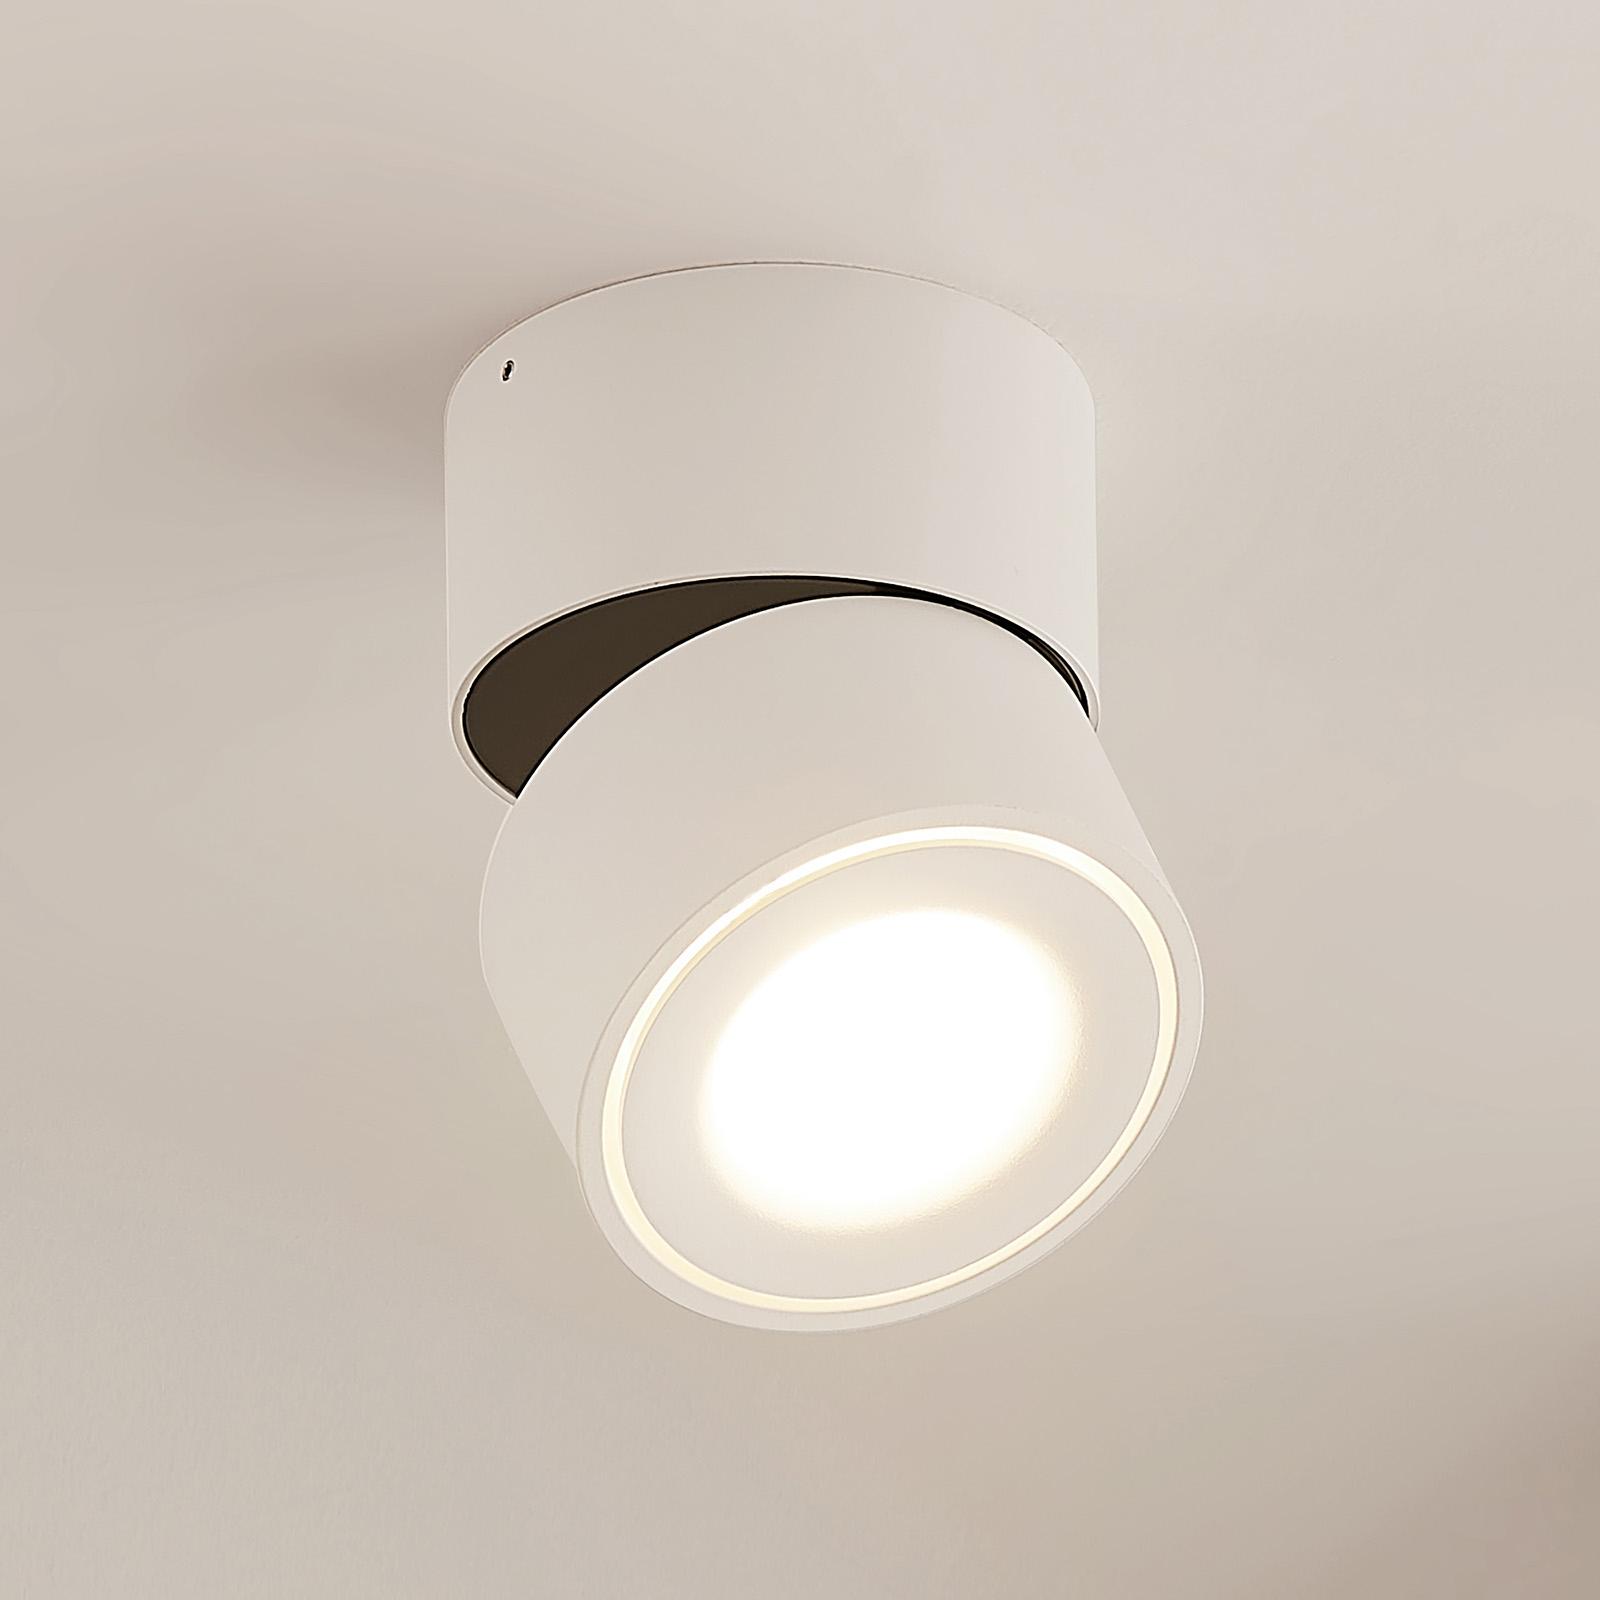 Arcchio Rotari spot sufitowy LED 1-punktowy 17,6W